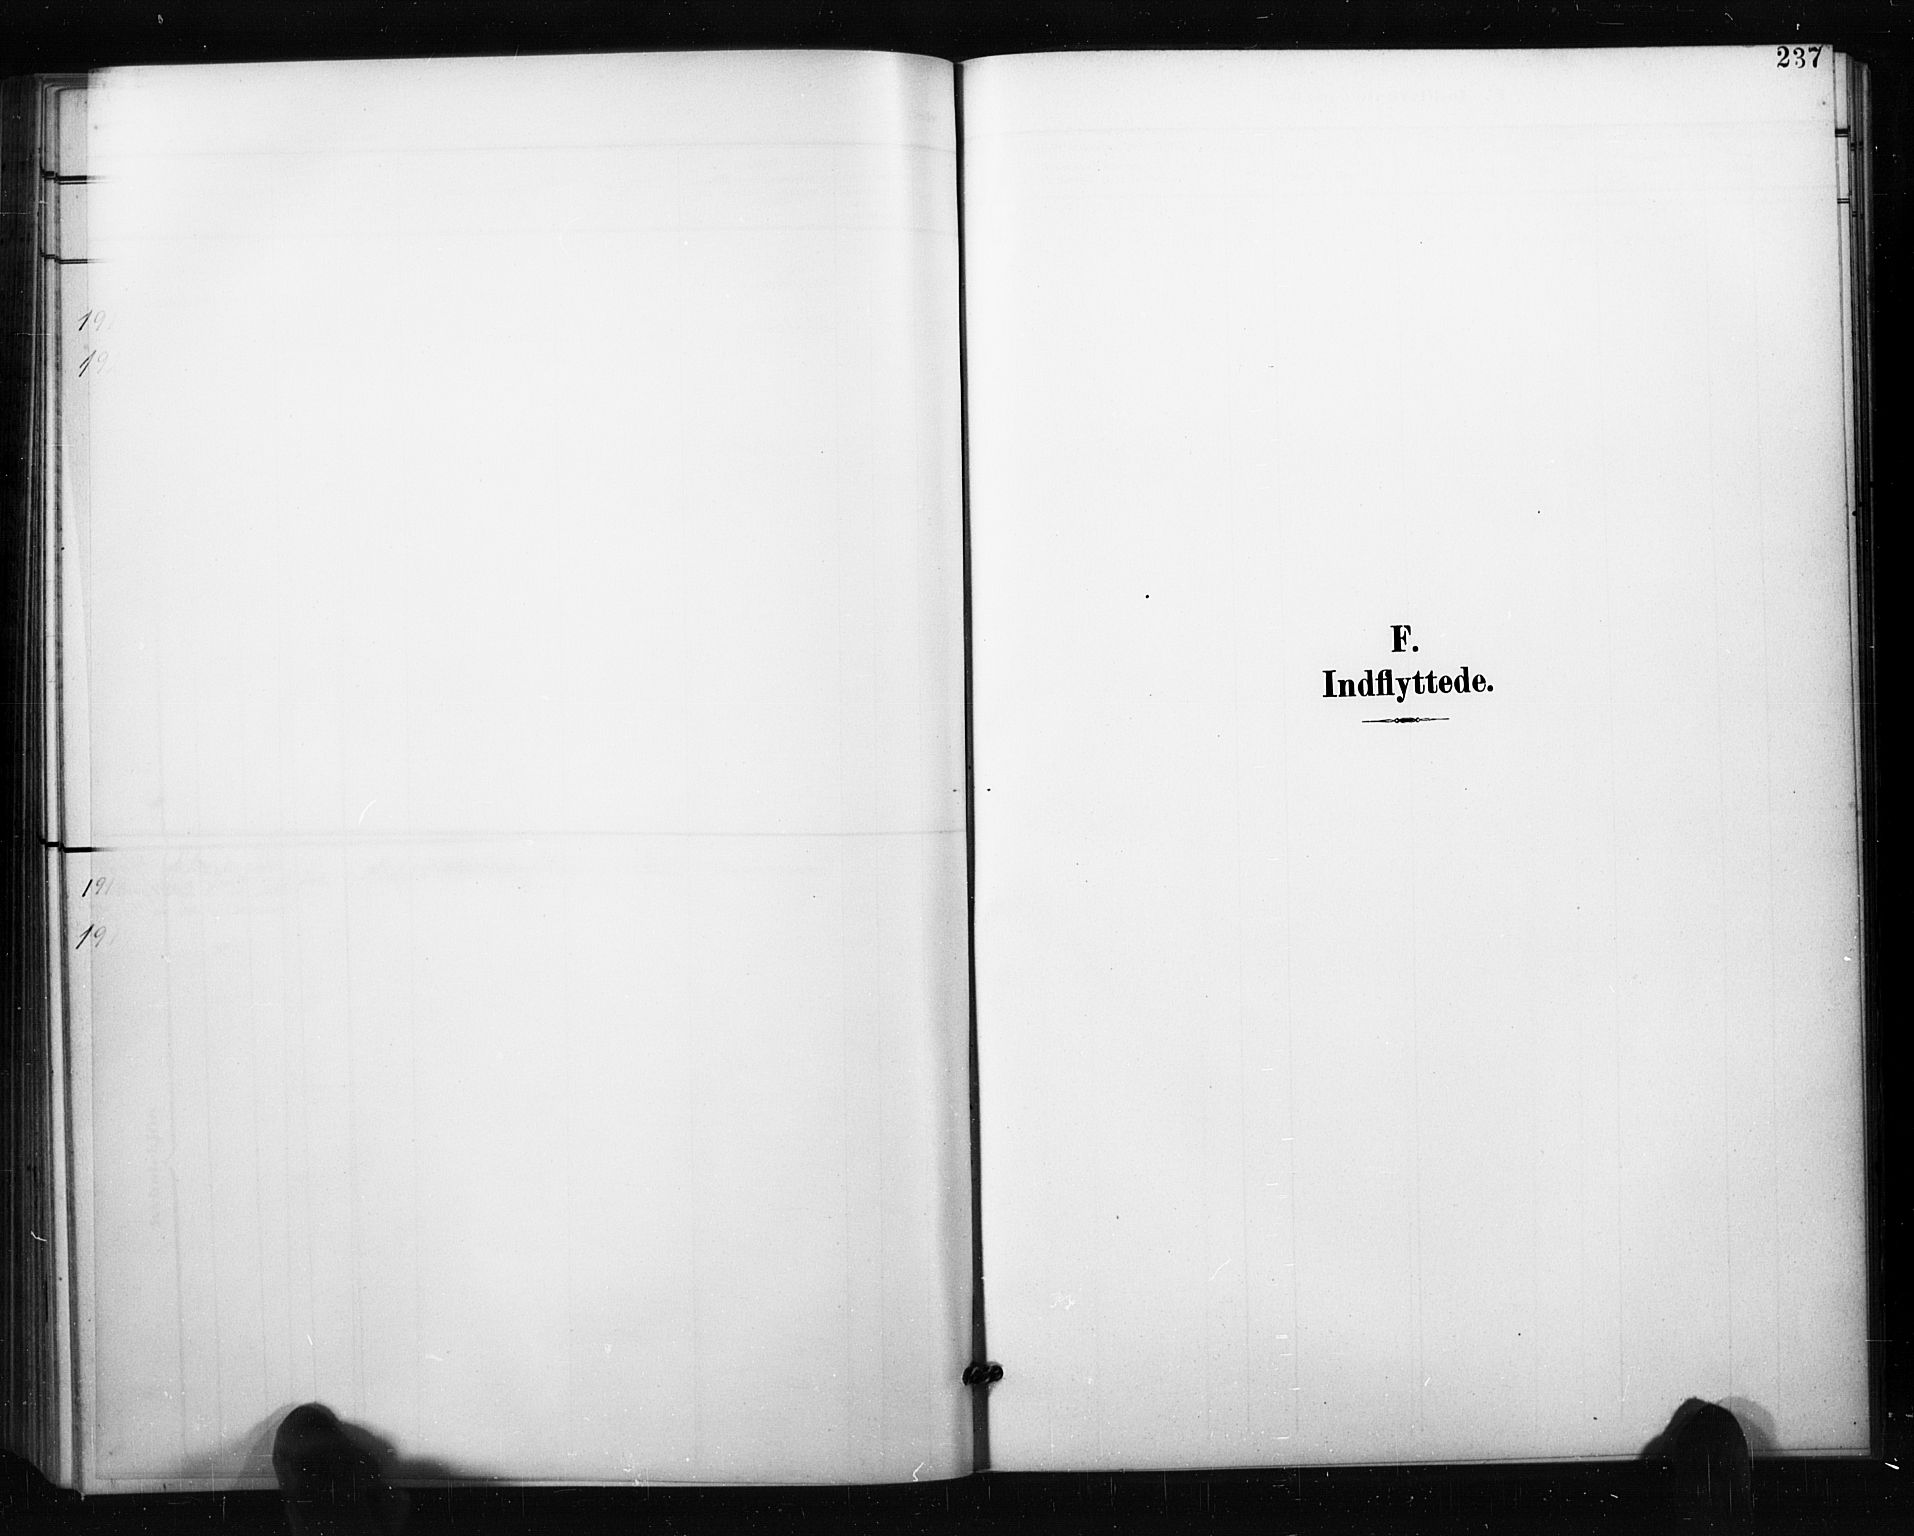 SAO, Aremark prestekontor Kirkebøker, G/Gb/L0001: Klokkerbok nr. II 1, 1901-1927, s. 237